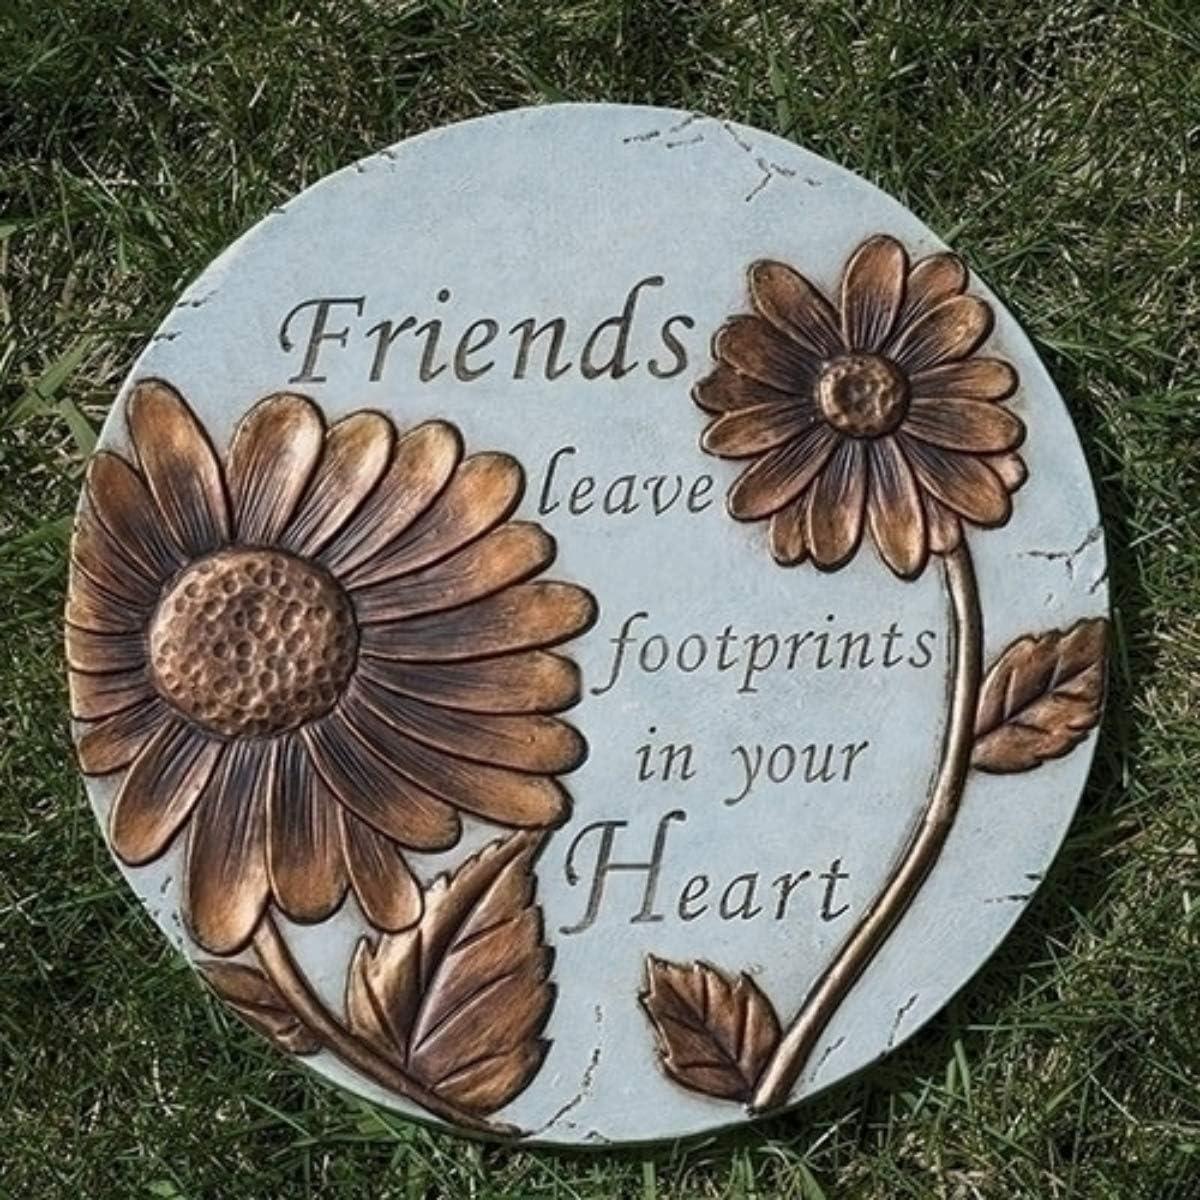 Garden Stone Ltd Friends Leave Footprints - Piedra de Escalada para jardín, 22,86 cm